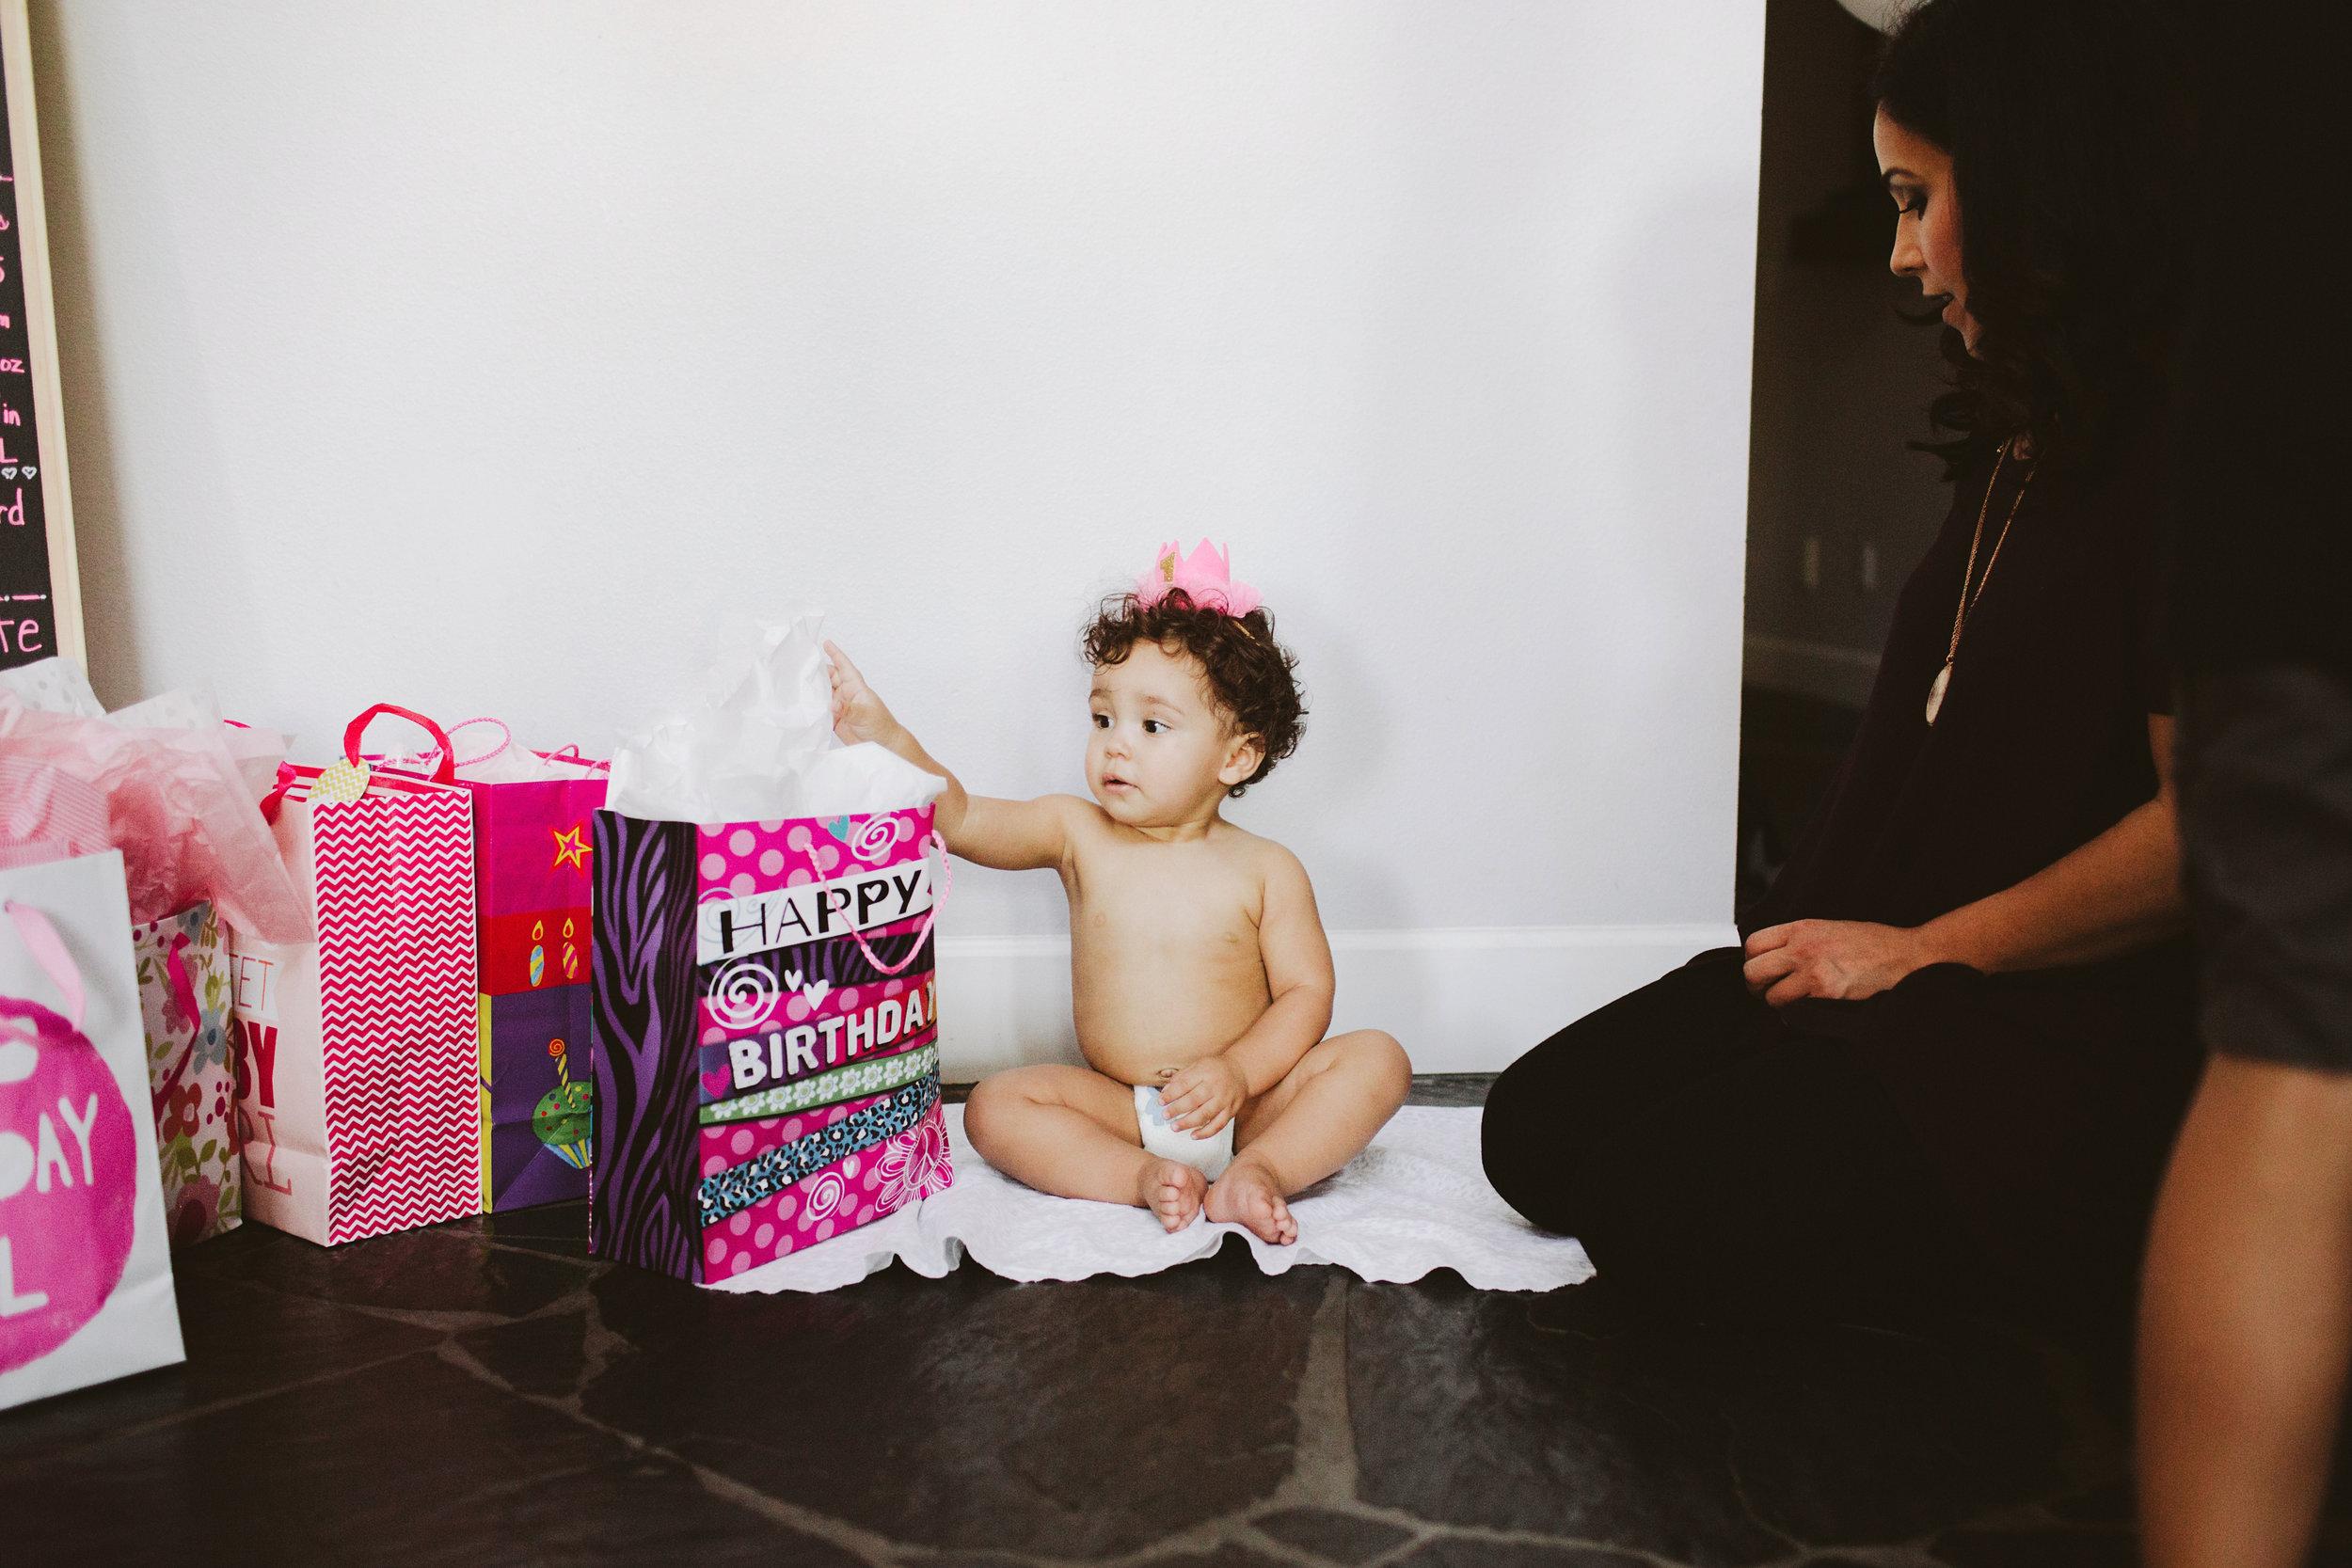 First Birthday | Vanessa Boy Photography | vanessaboy.com |-79.com |final.jpg